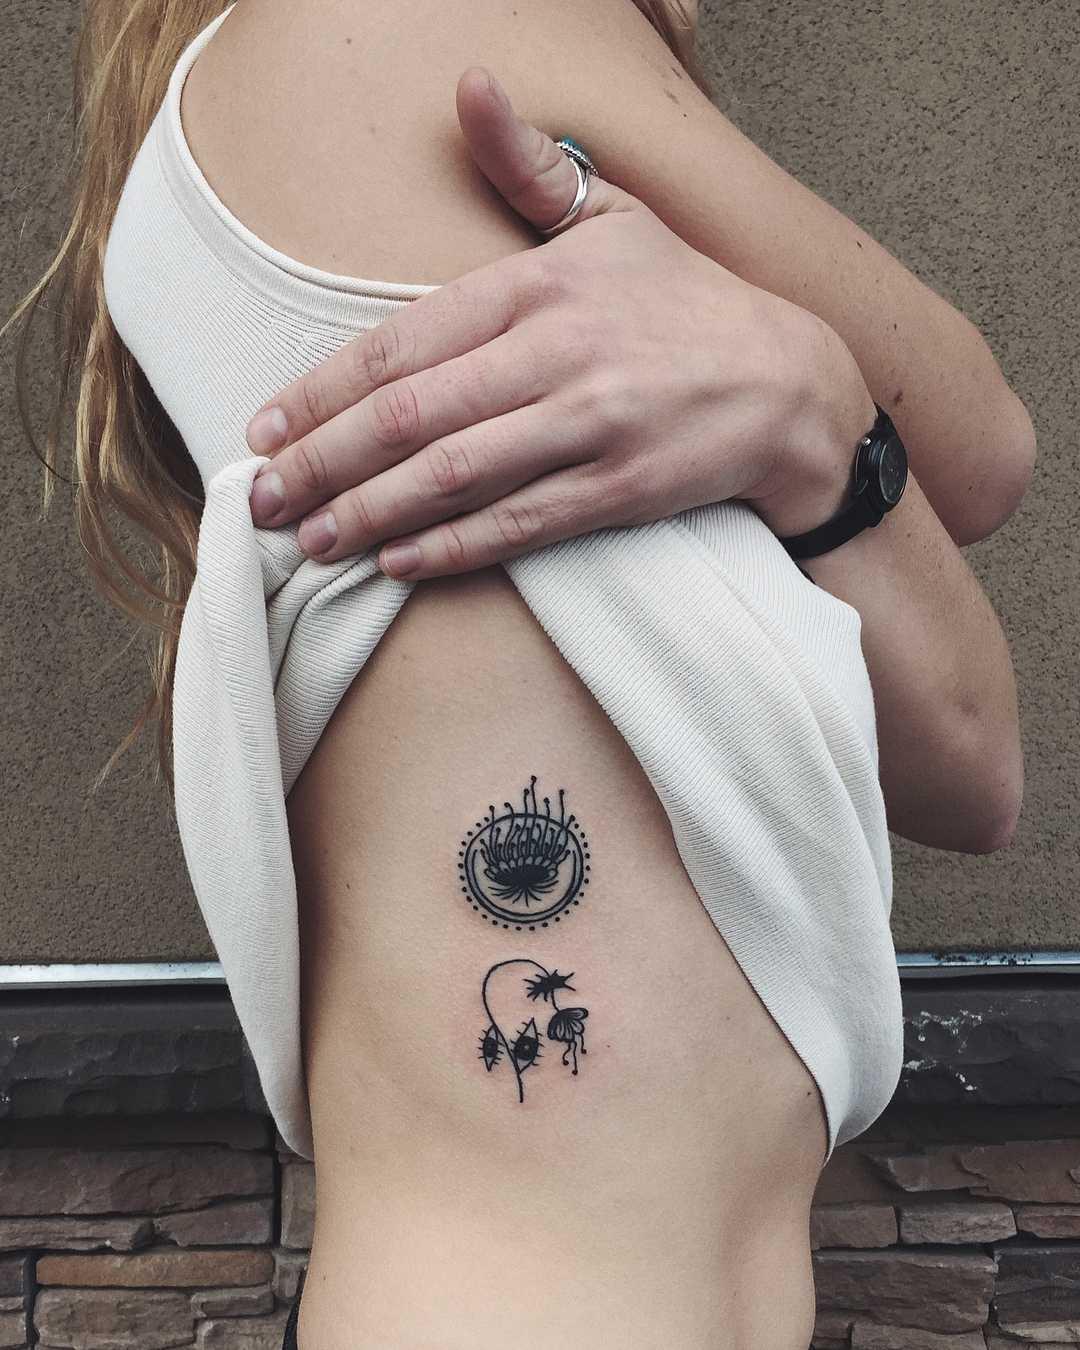 Tiny botanical tattoos on the rib